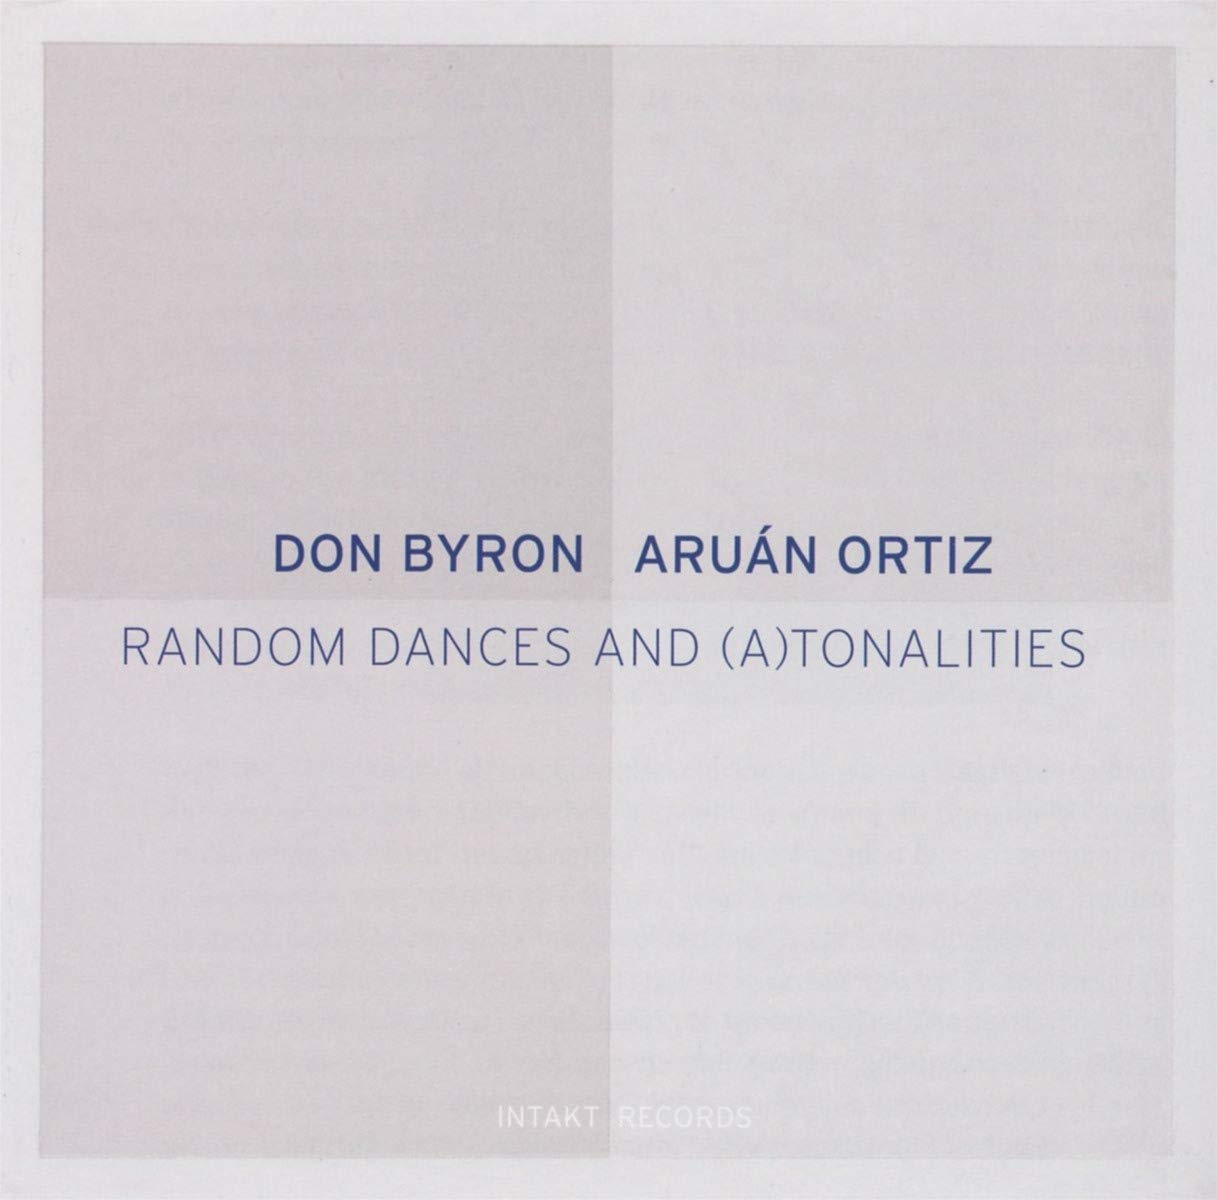 CD : Don Byron - Random Dances & Atonalities (CD)